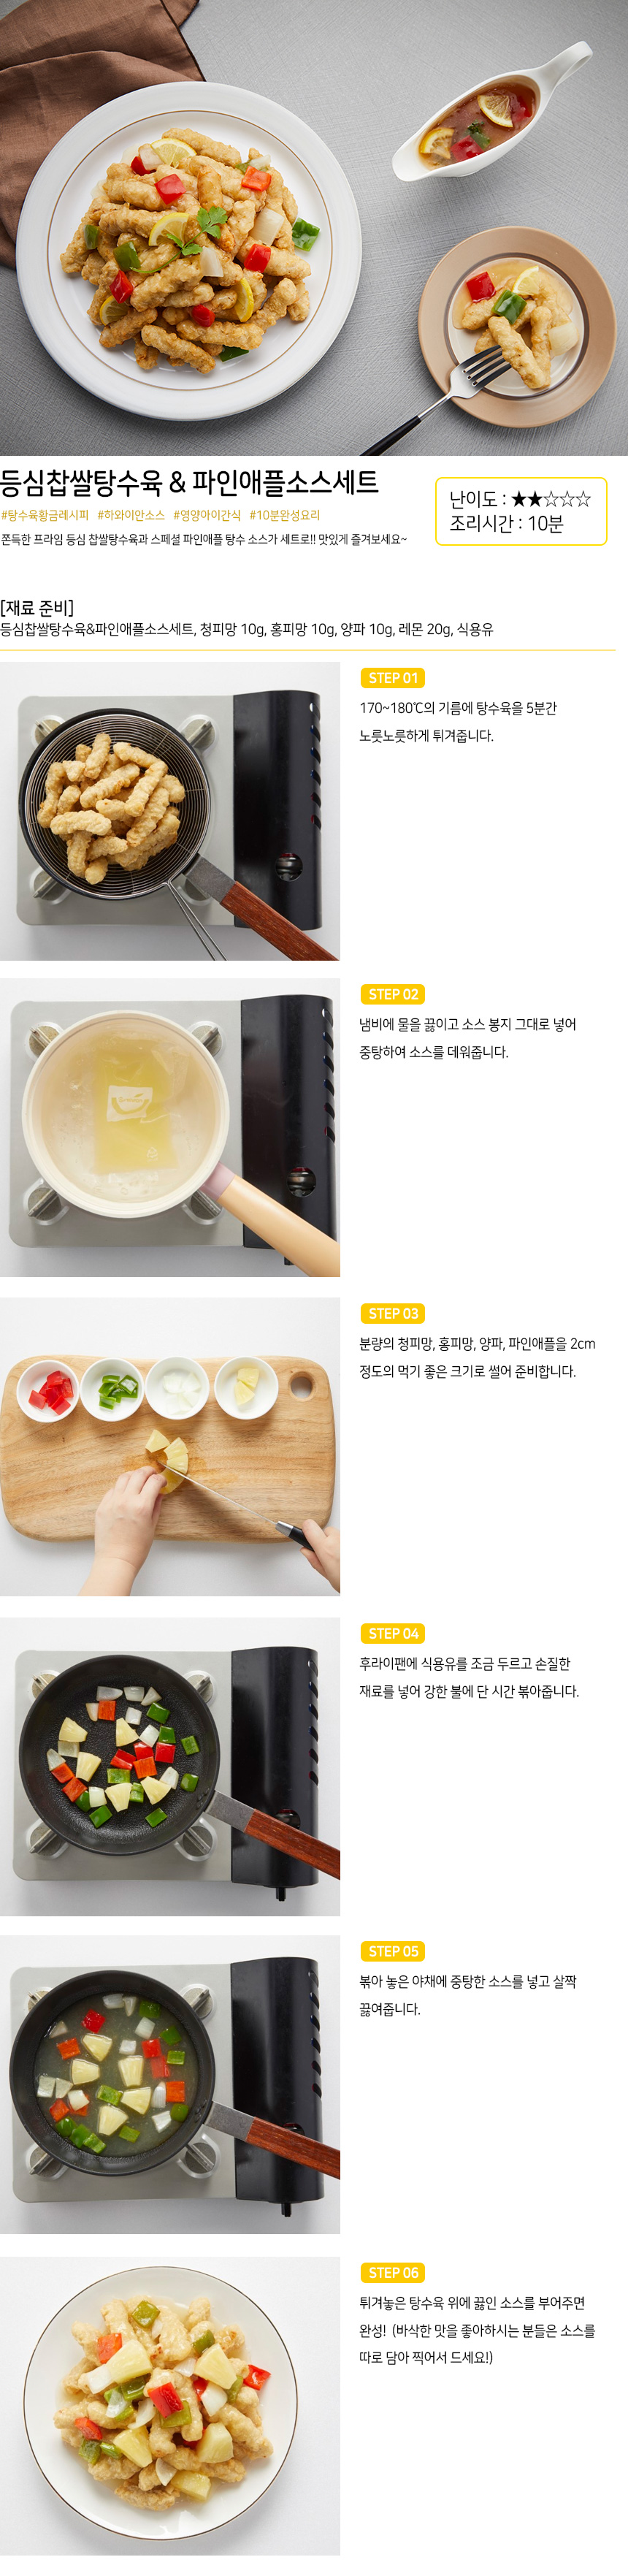 recipe_22117.jpg